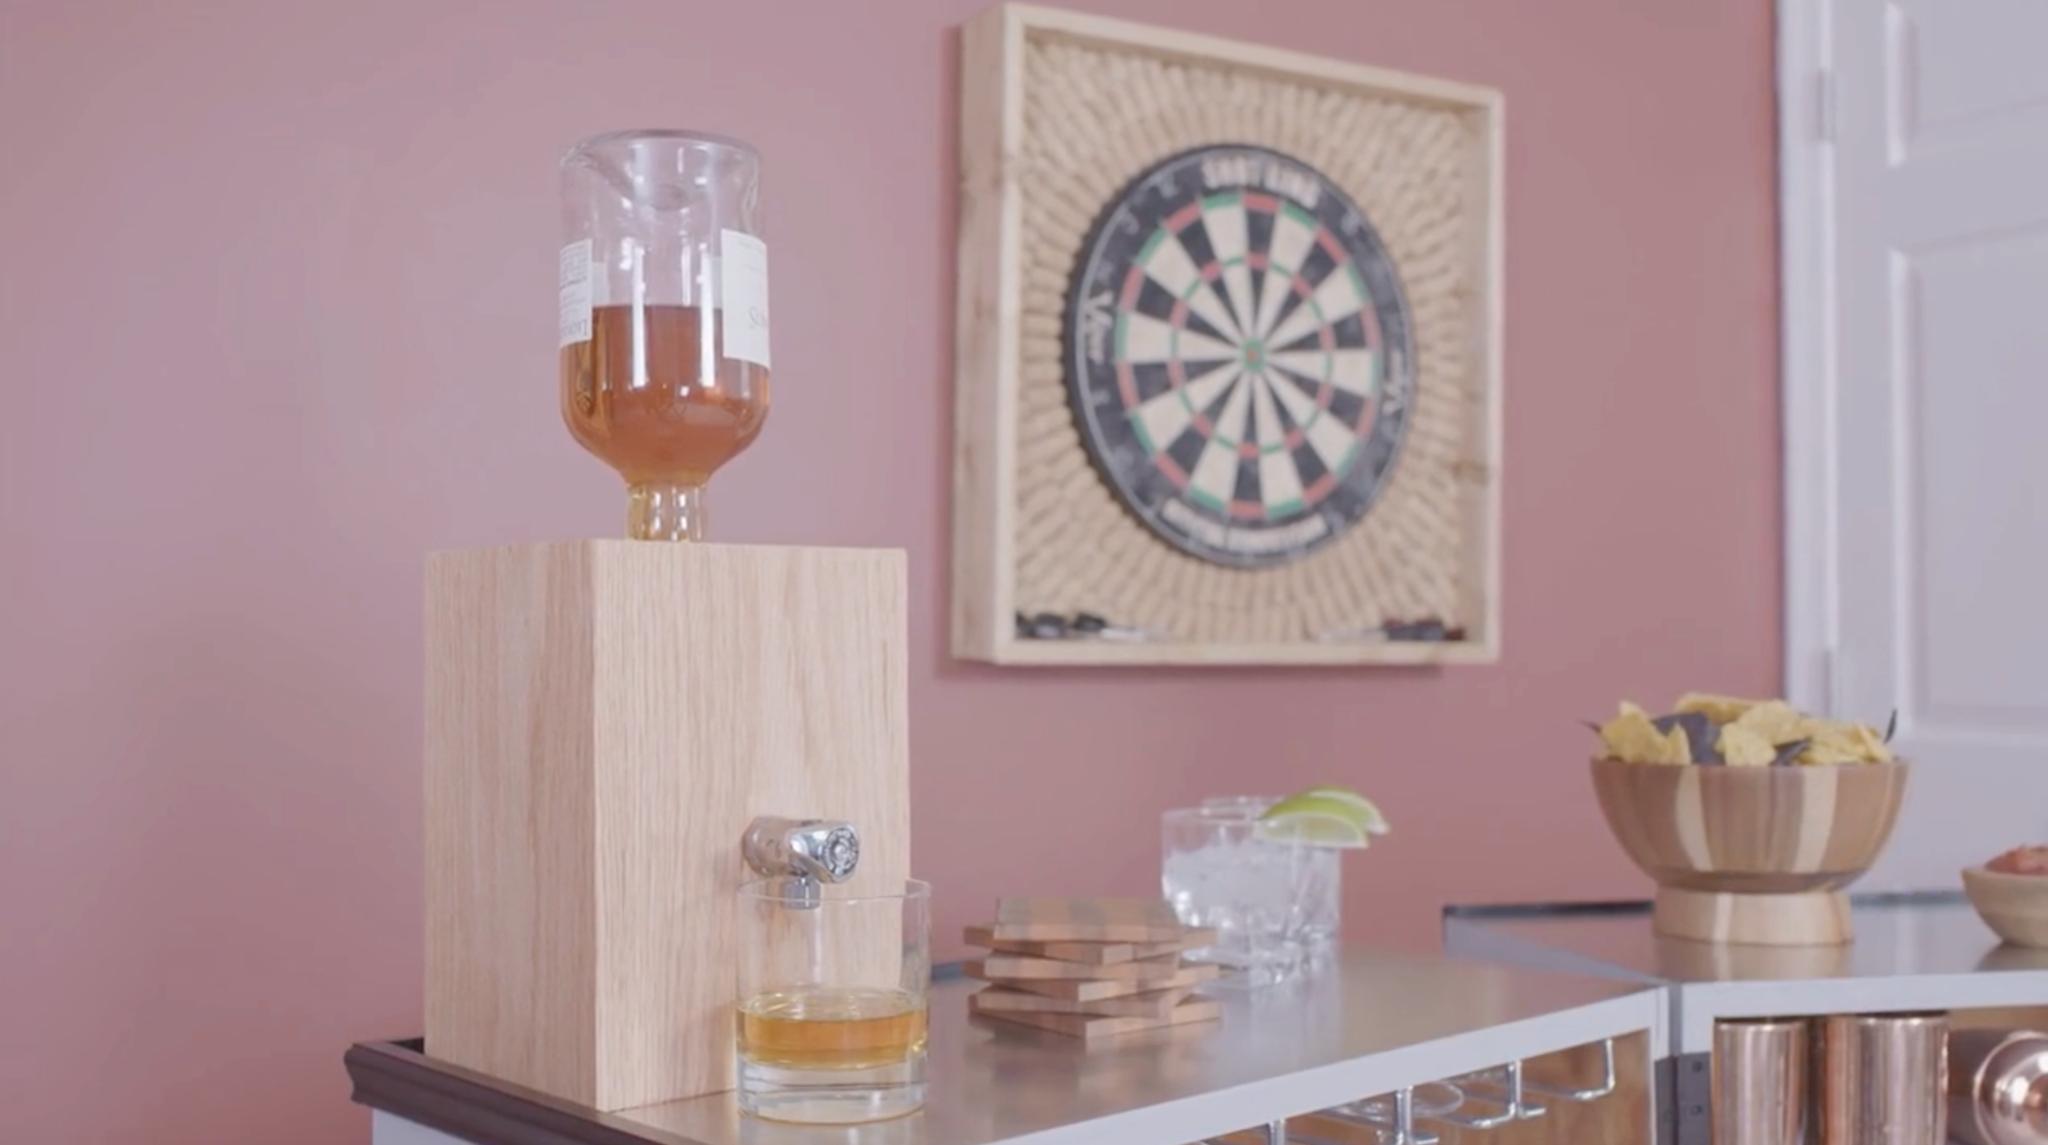 Stock your DIY liquor dispenser!